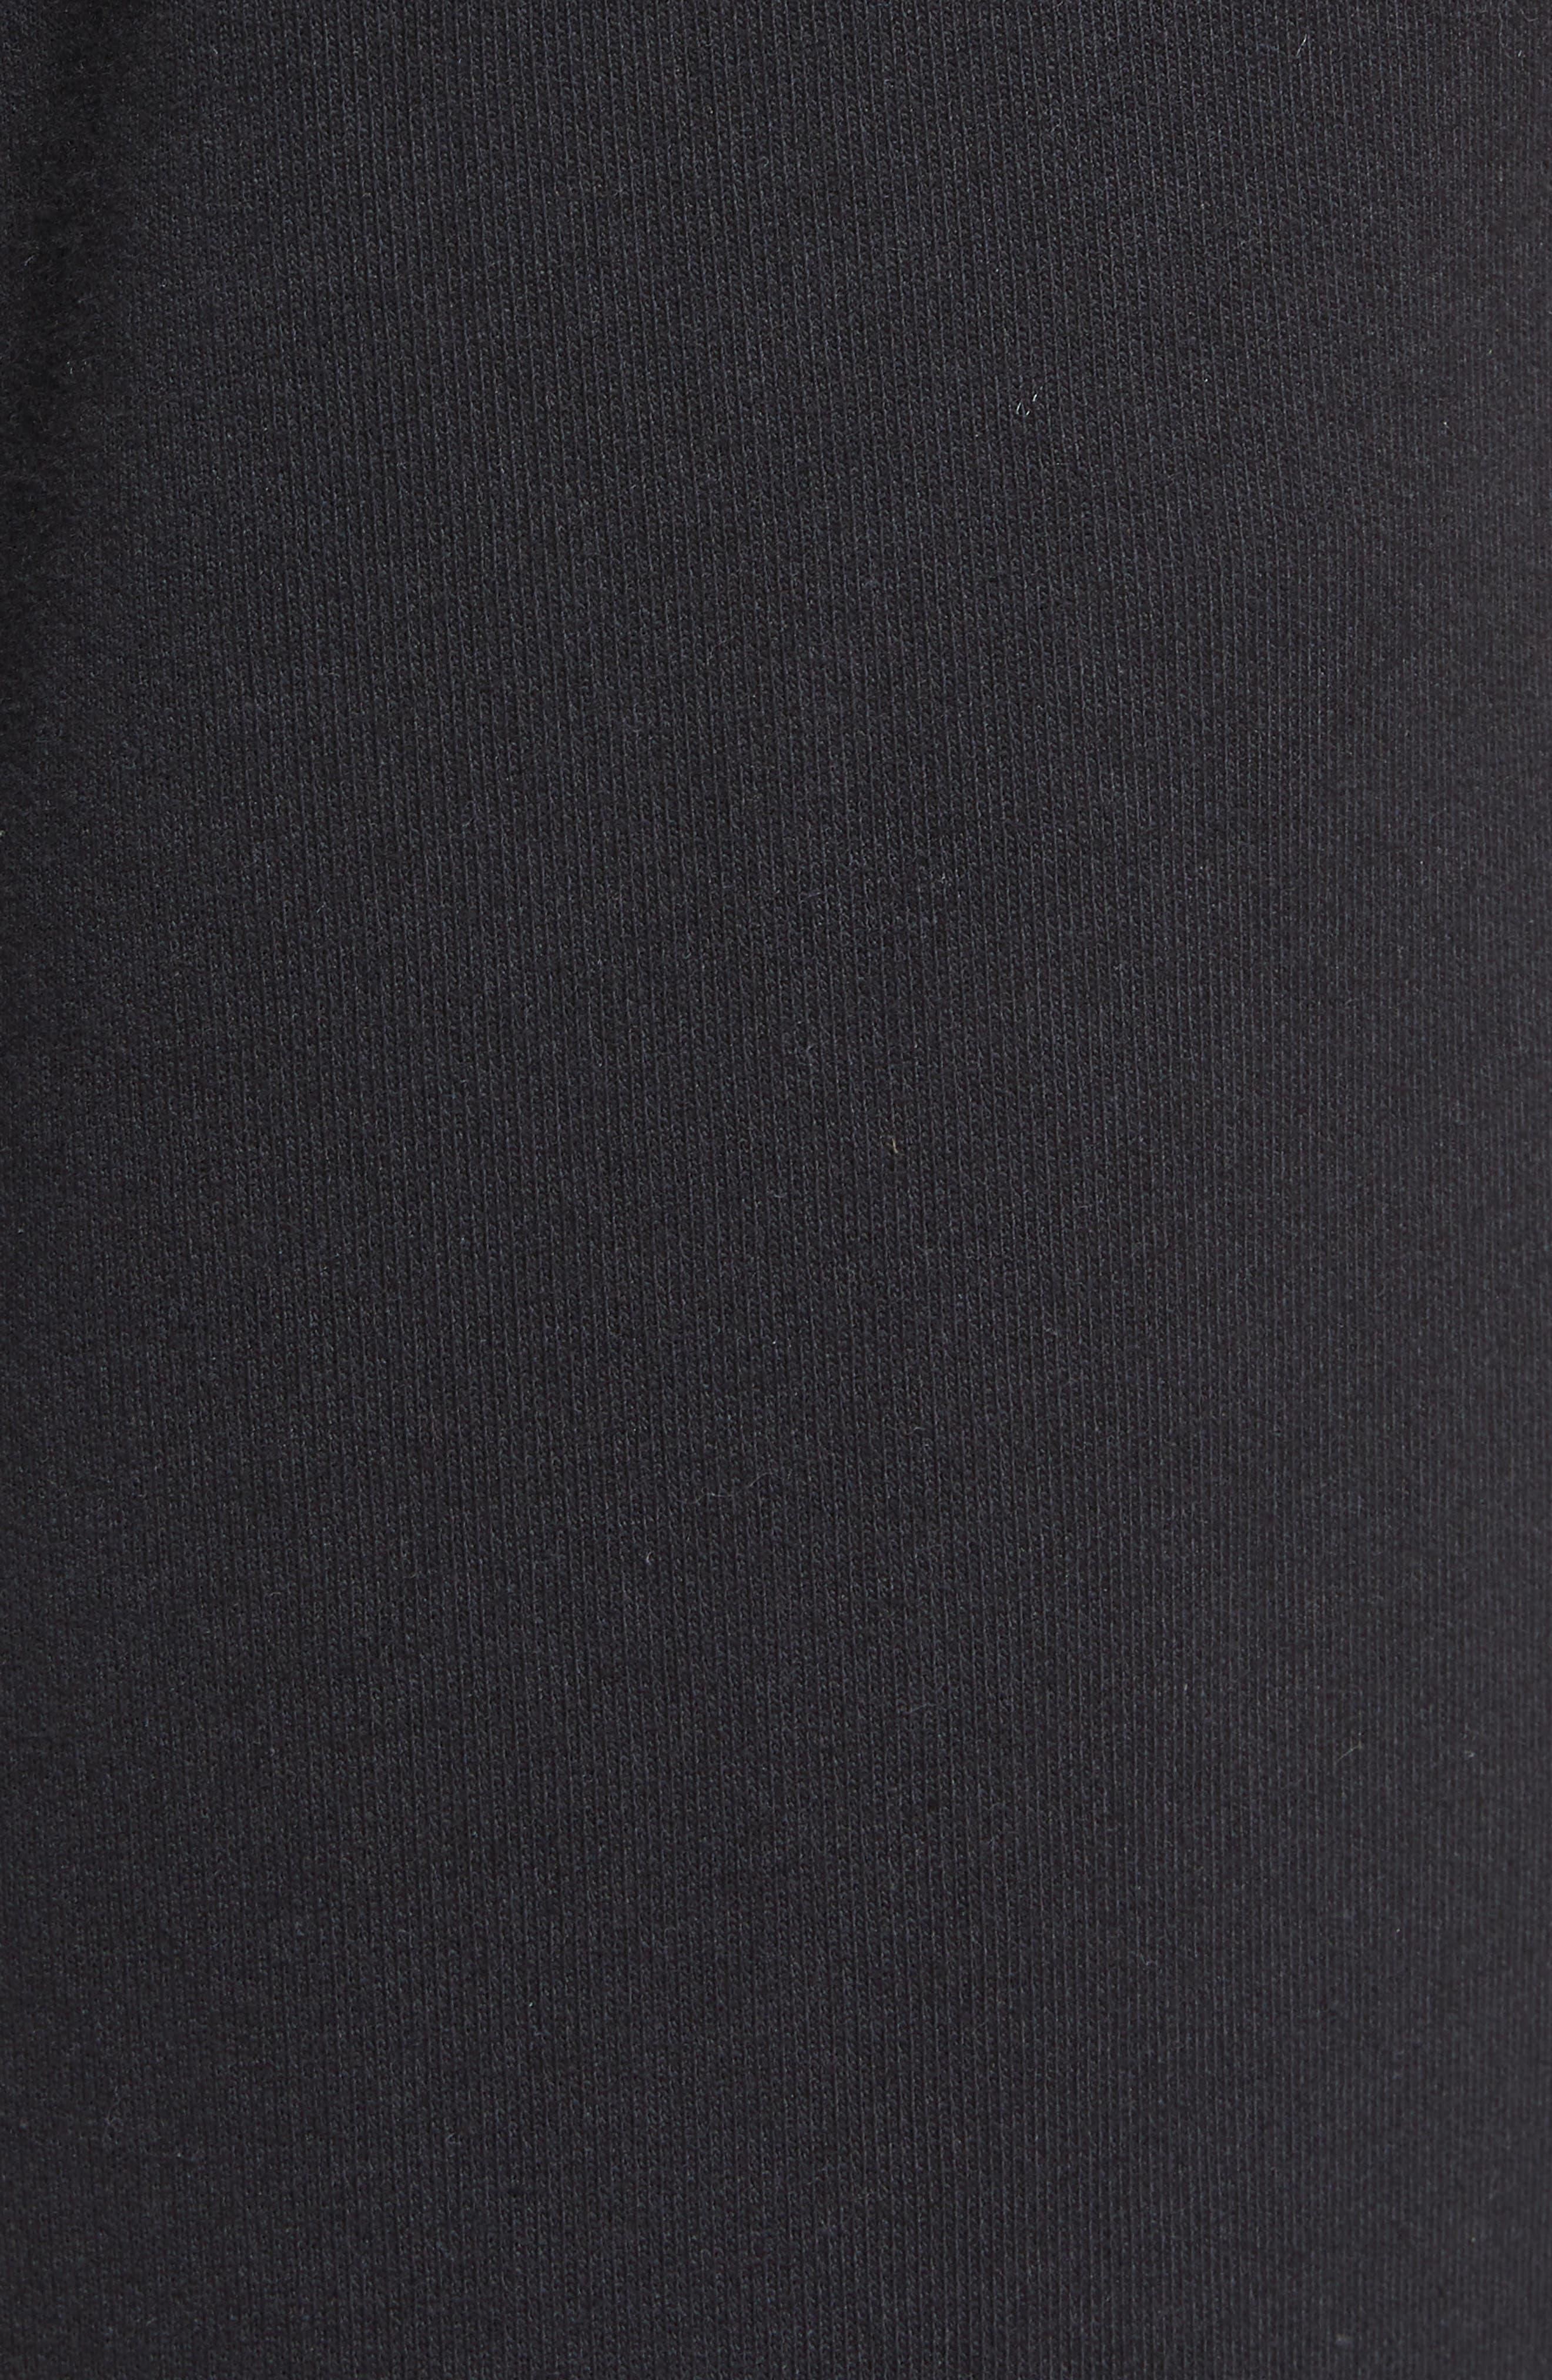 Cropped Sweatpants,                             Alternate thumbnail 5, color,                             001